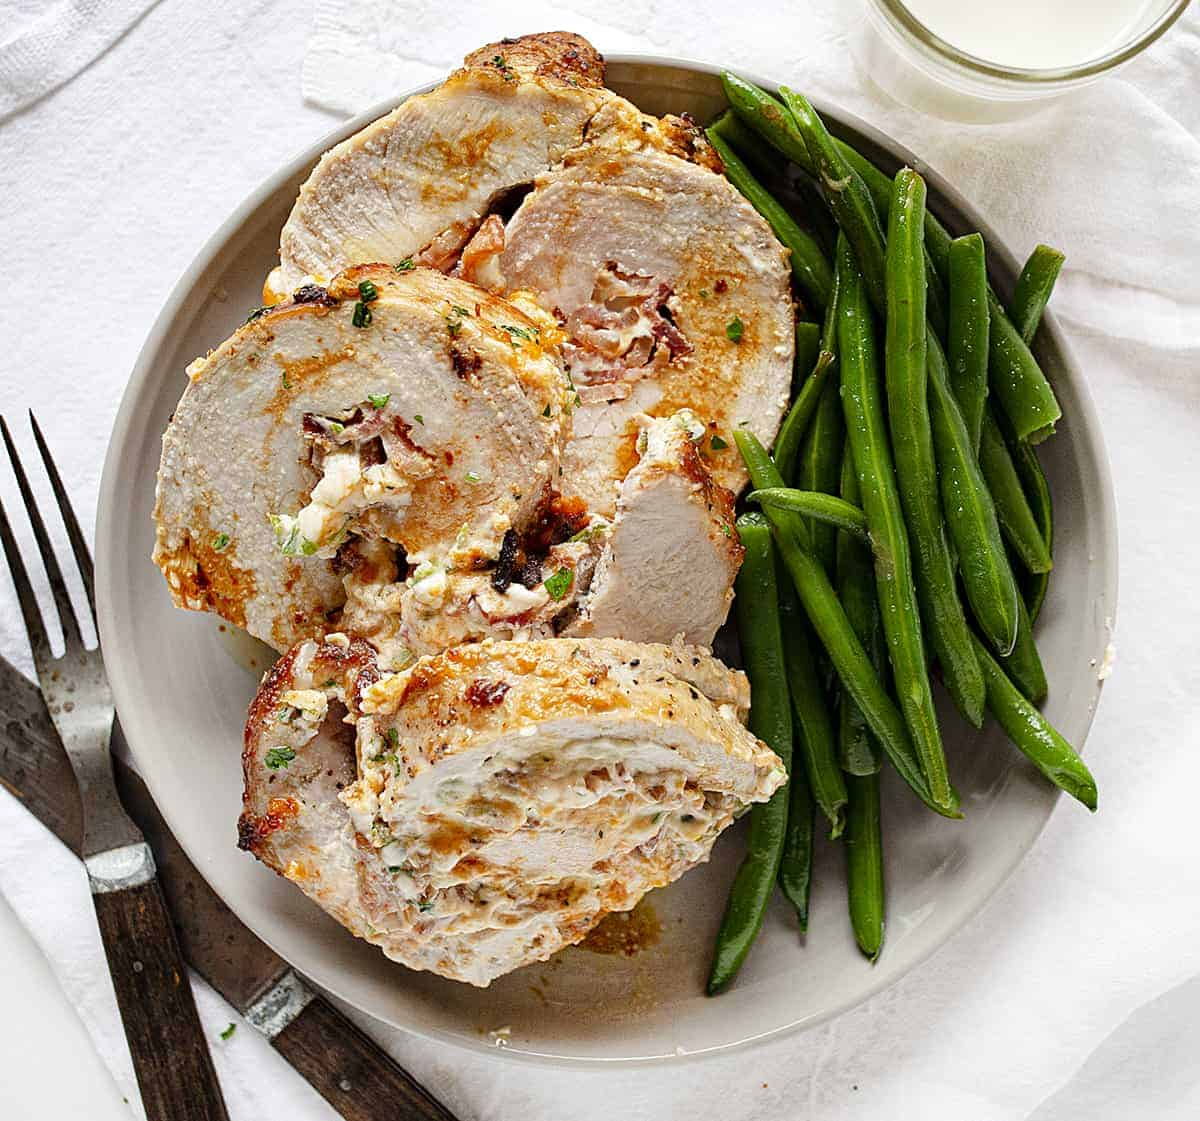 Plated Jalapeno Popper Pork Loin